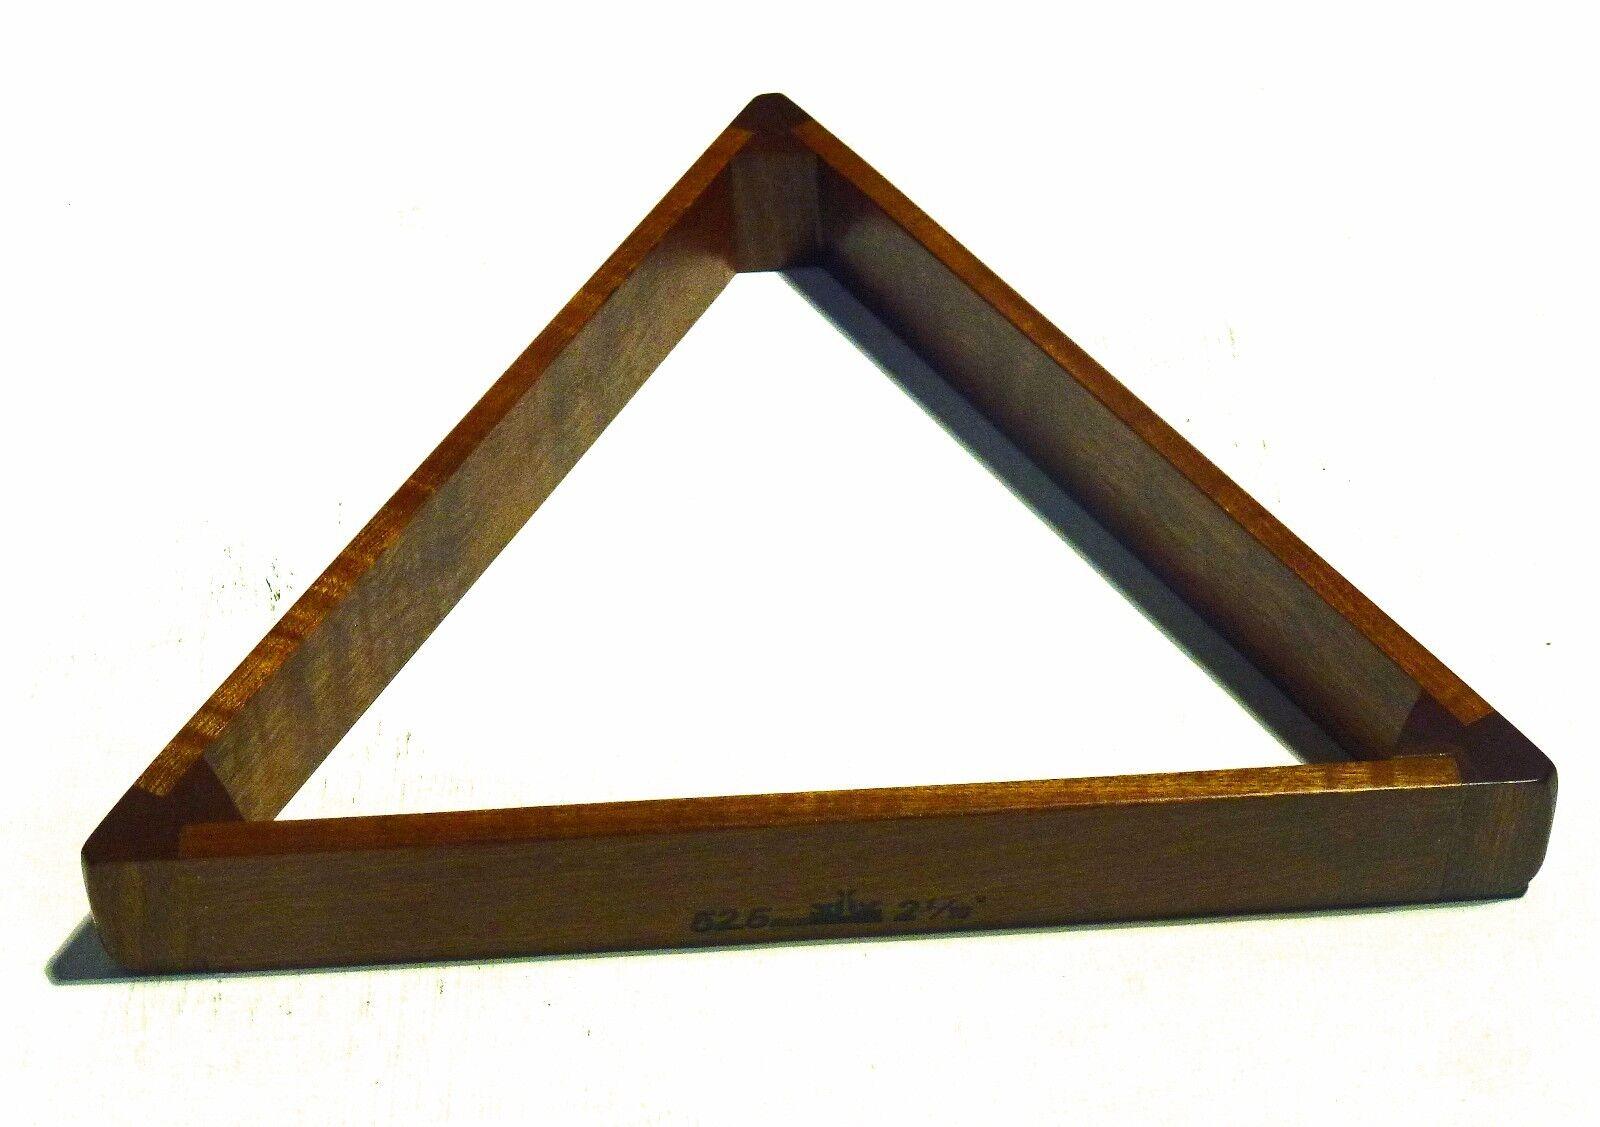 Peradon Englisch hergestellt massiv Mahagoni 2 0.2cm Dreieck für Lebensgroß Lebensgroß Lebensgroß b865f4